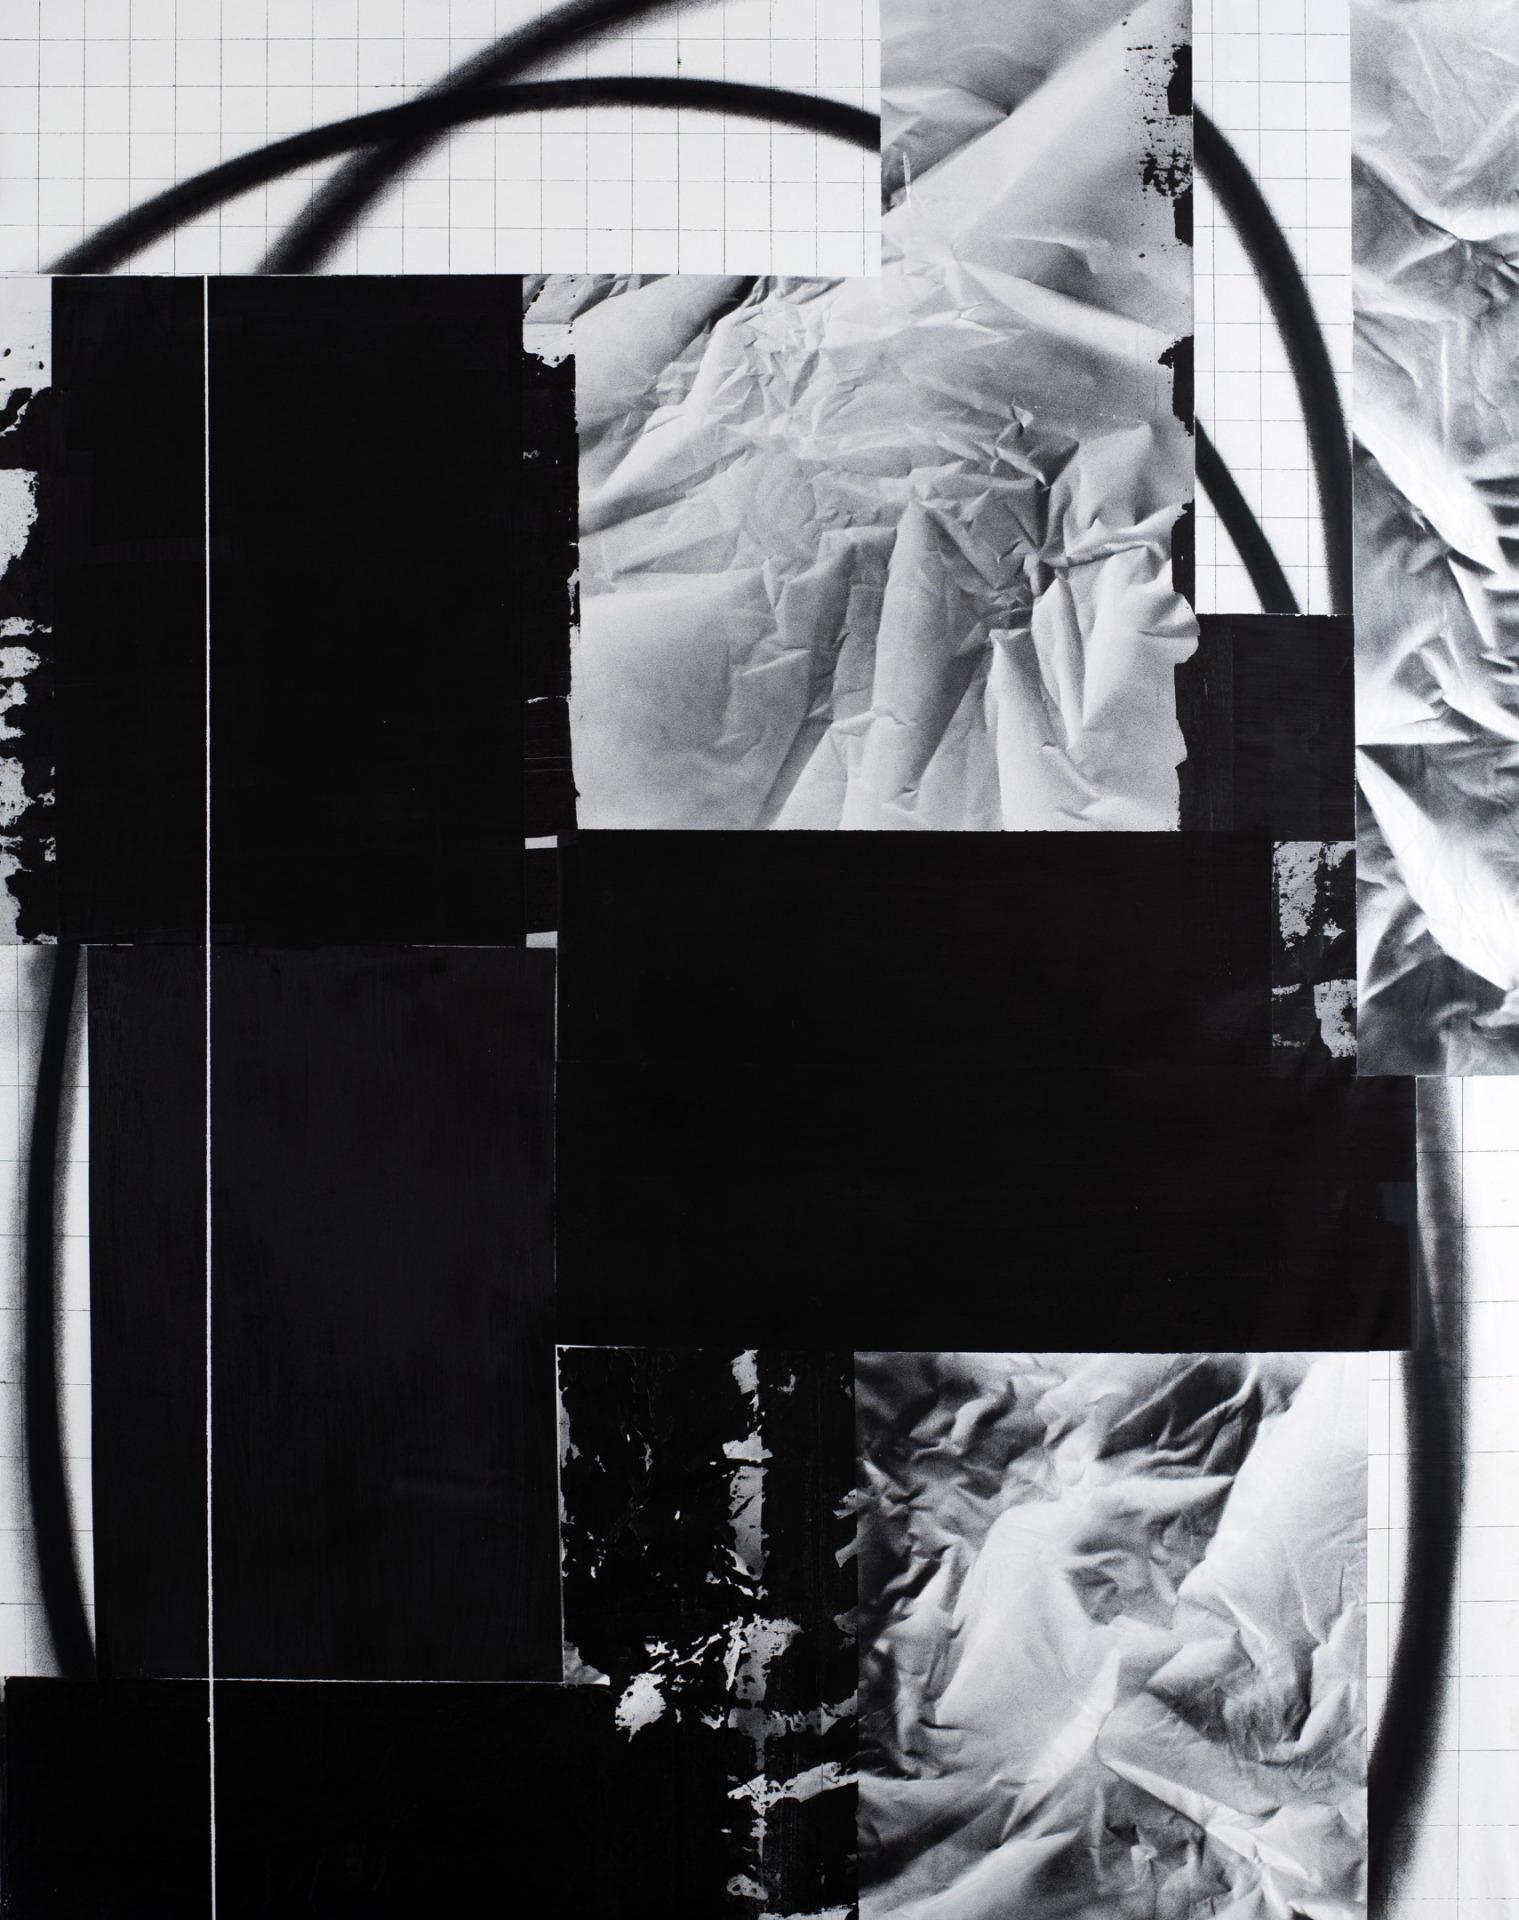 Contemporary art from Gyula Sági | op250821. 1